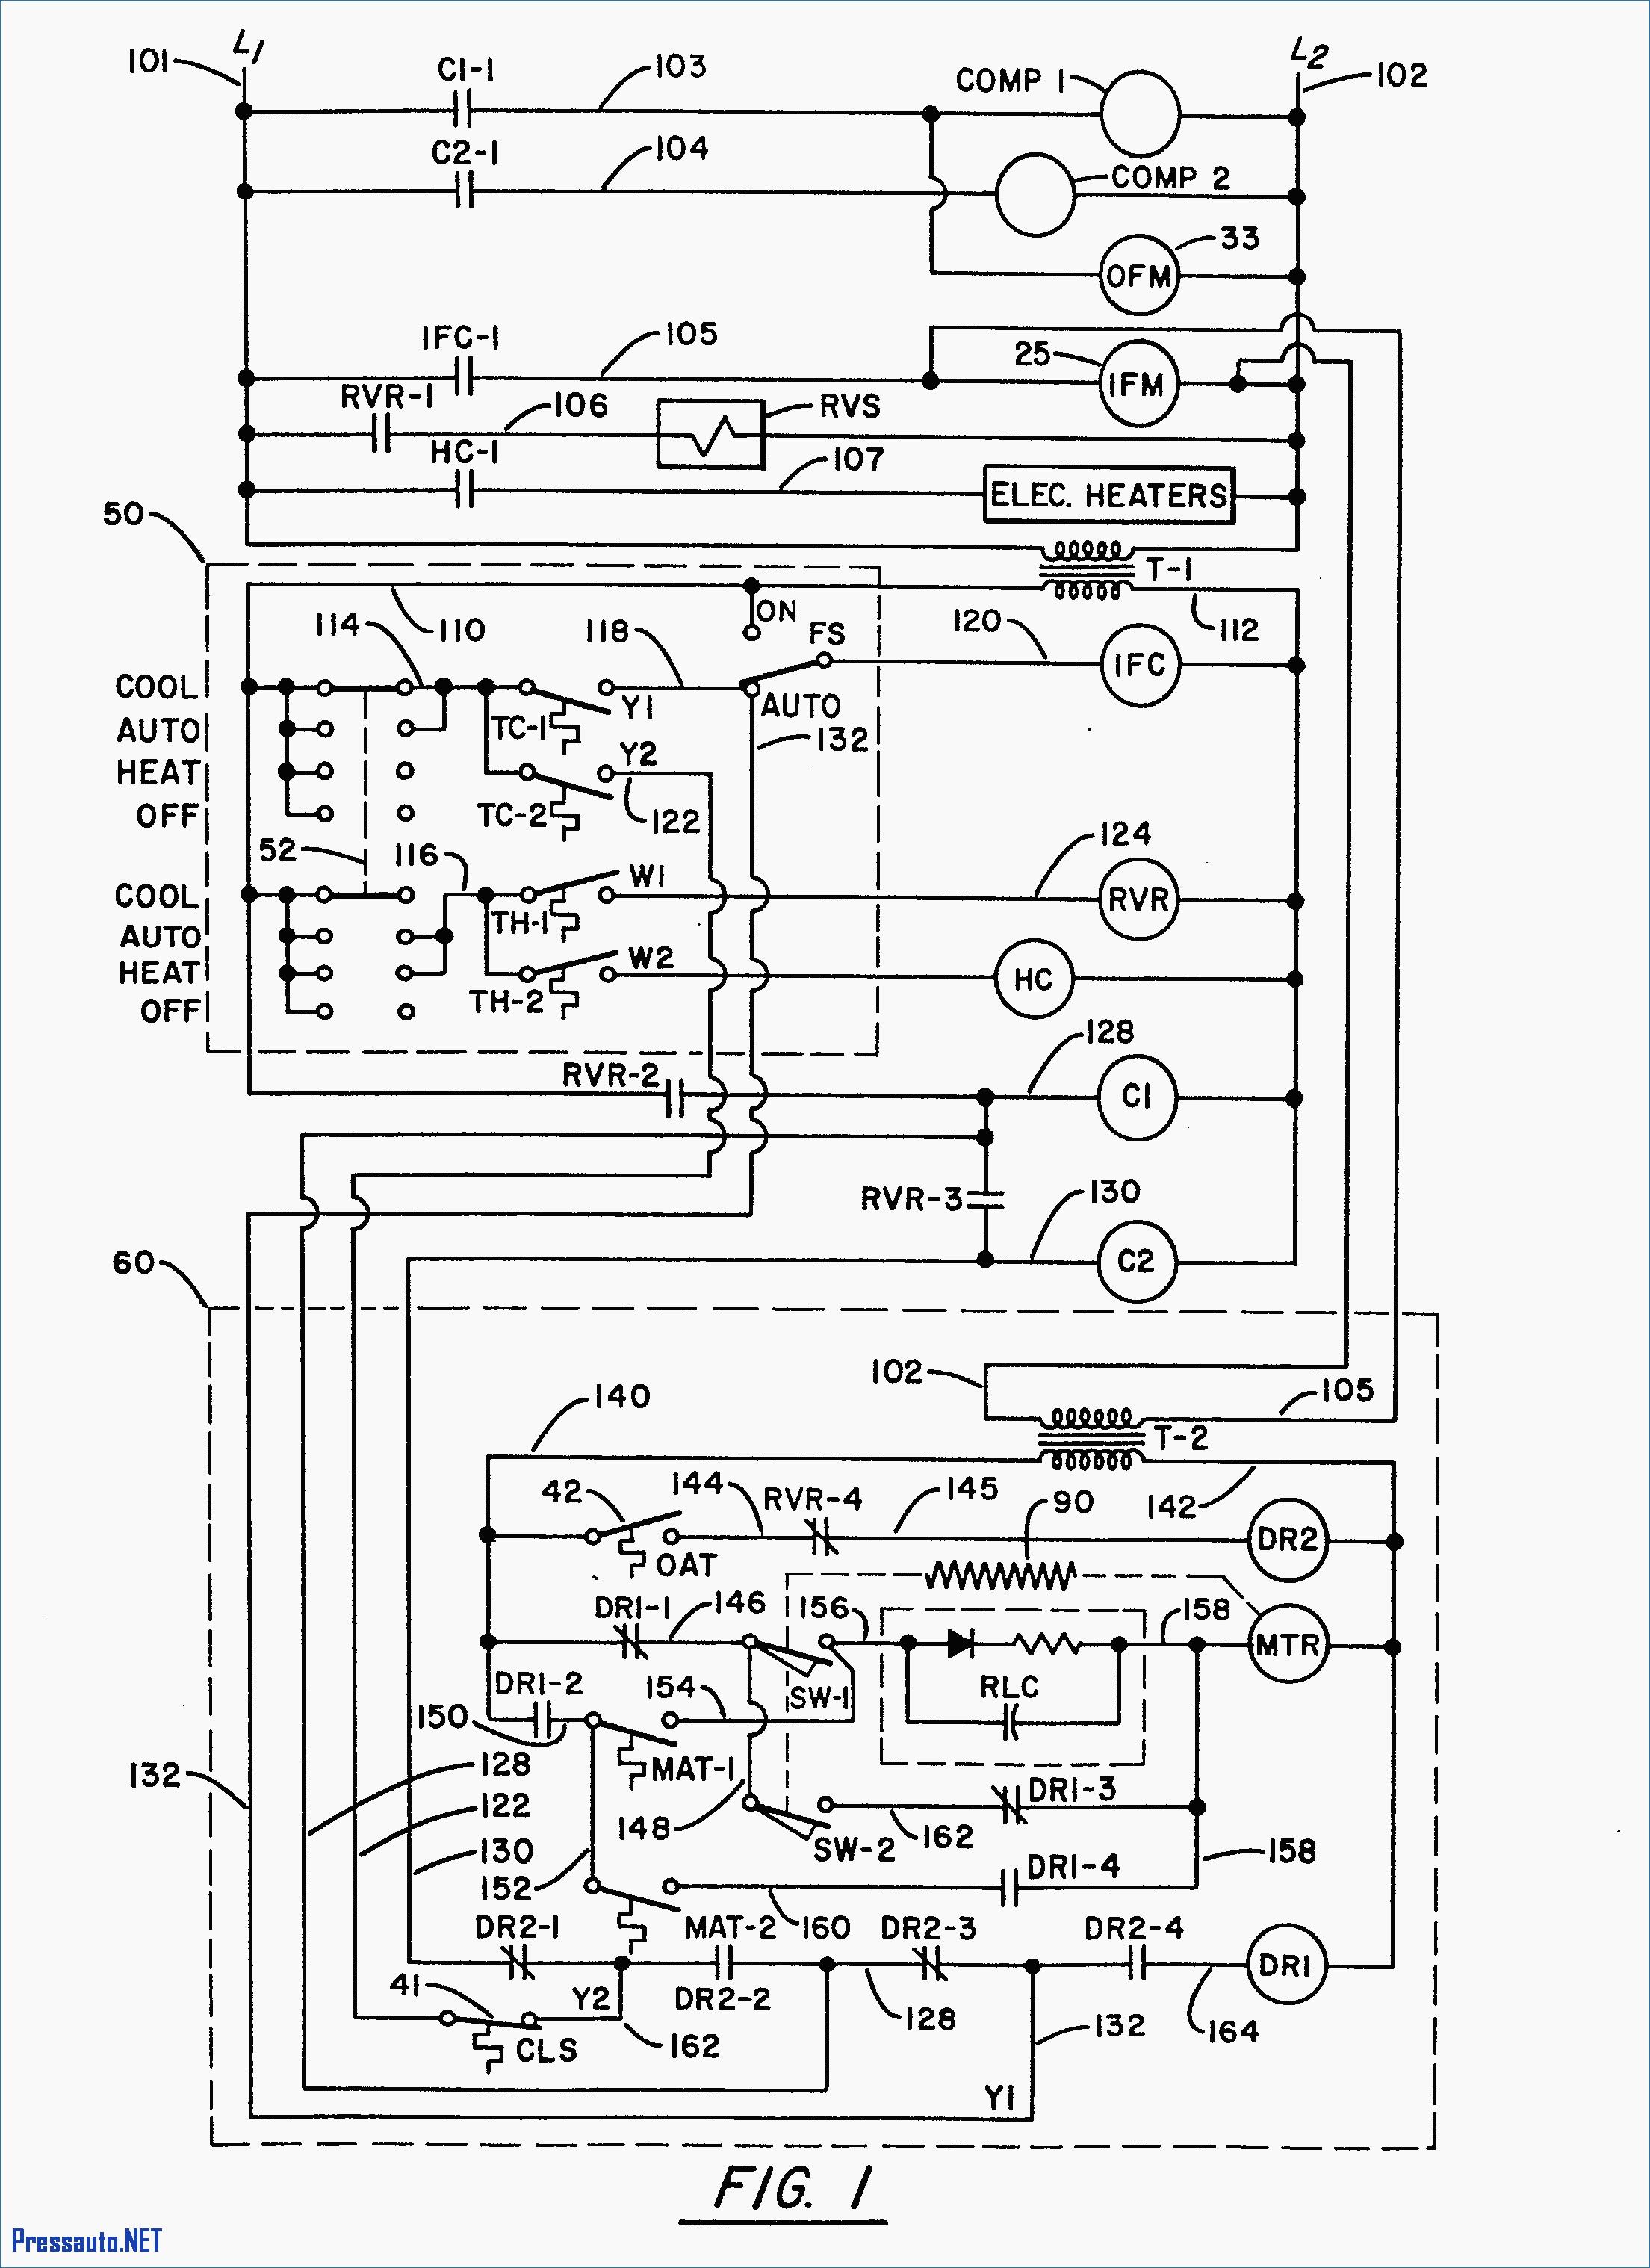 Ideas Trane Xe 1200 Wiring Diagram Trane Xe 1000 Schematic Wiring Diagrams Trane